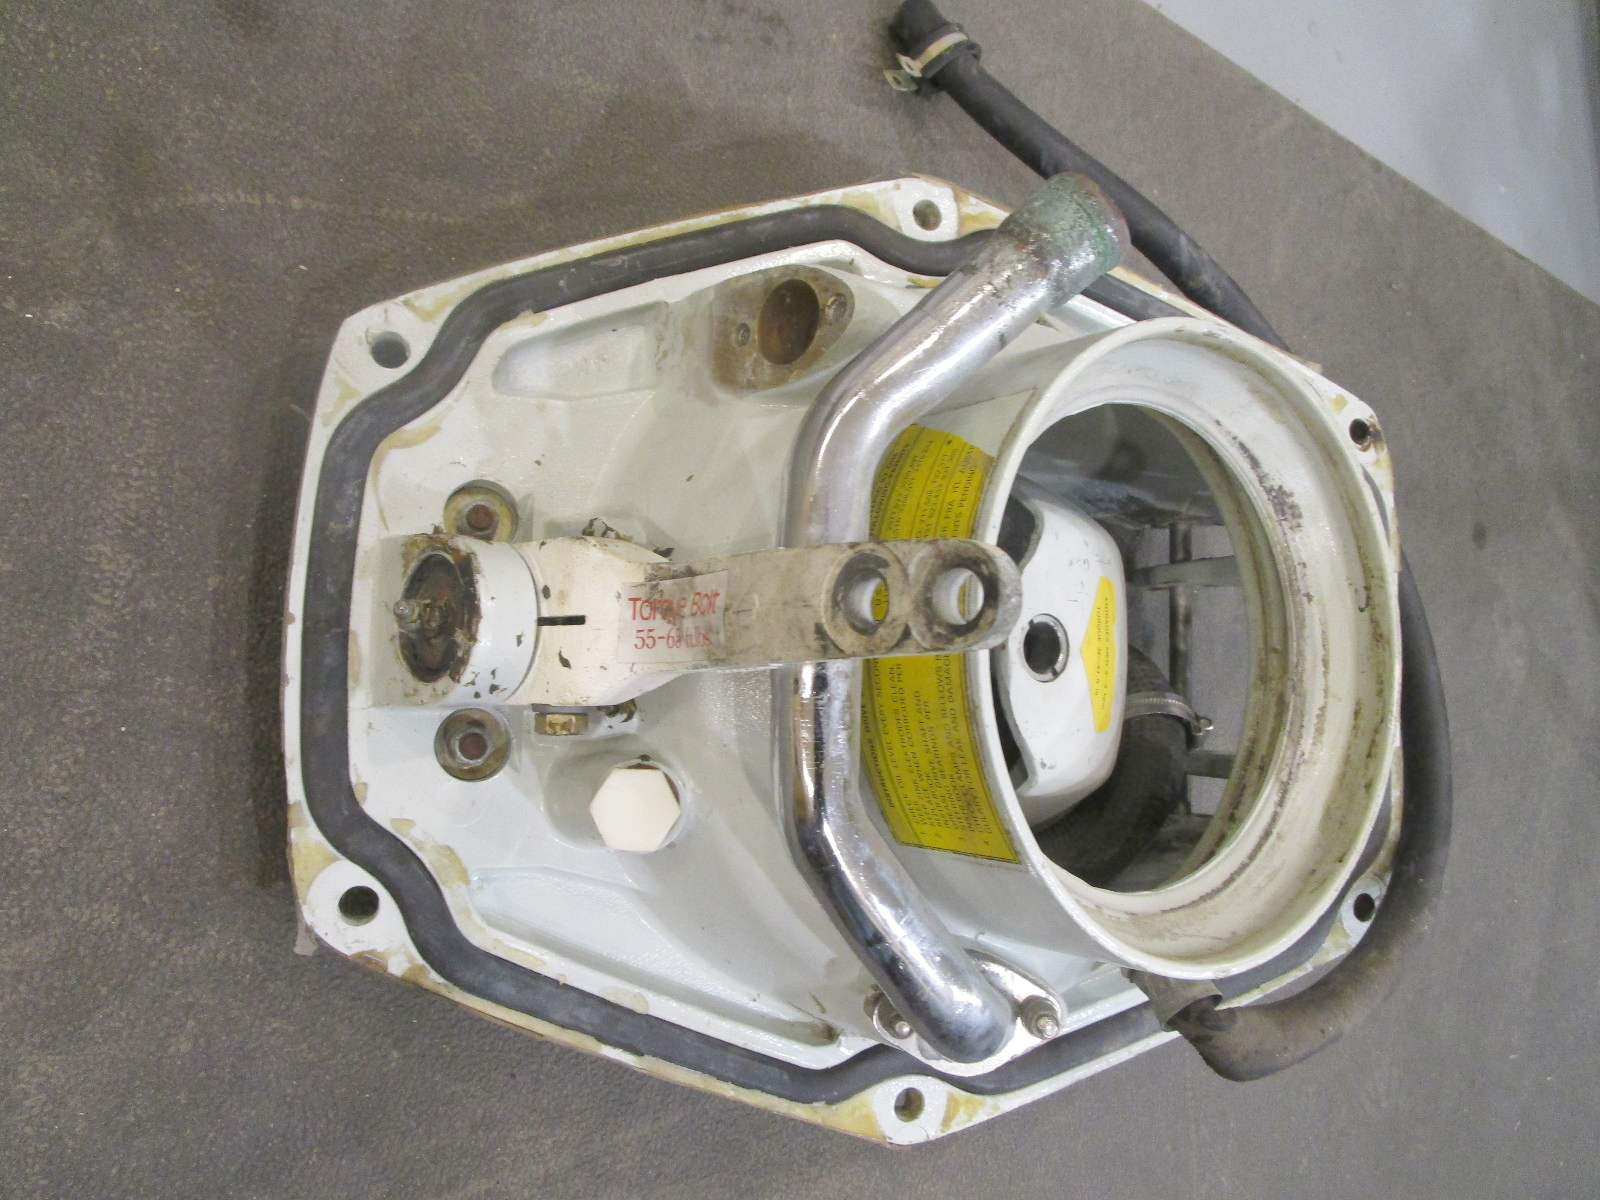 Volvo Penta aq130 manual